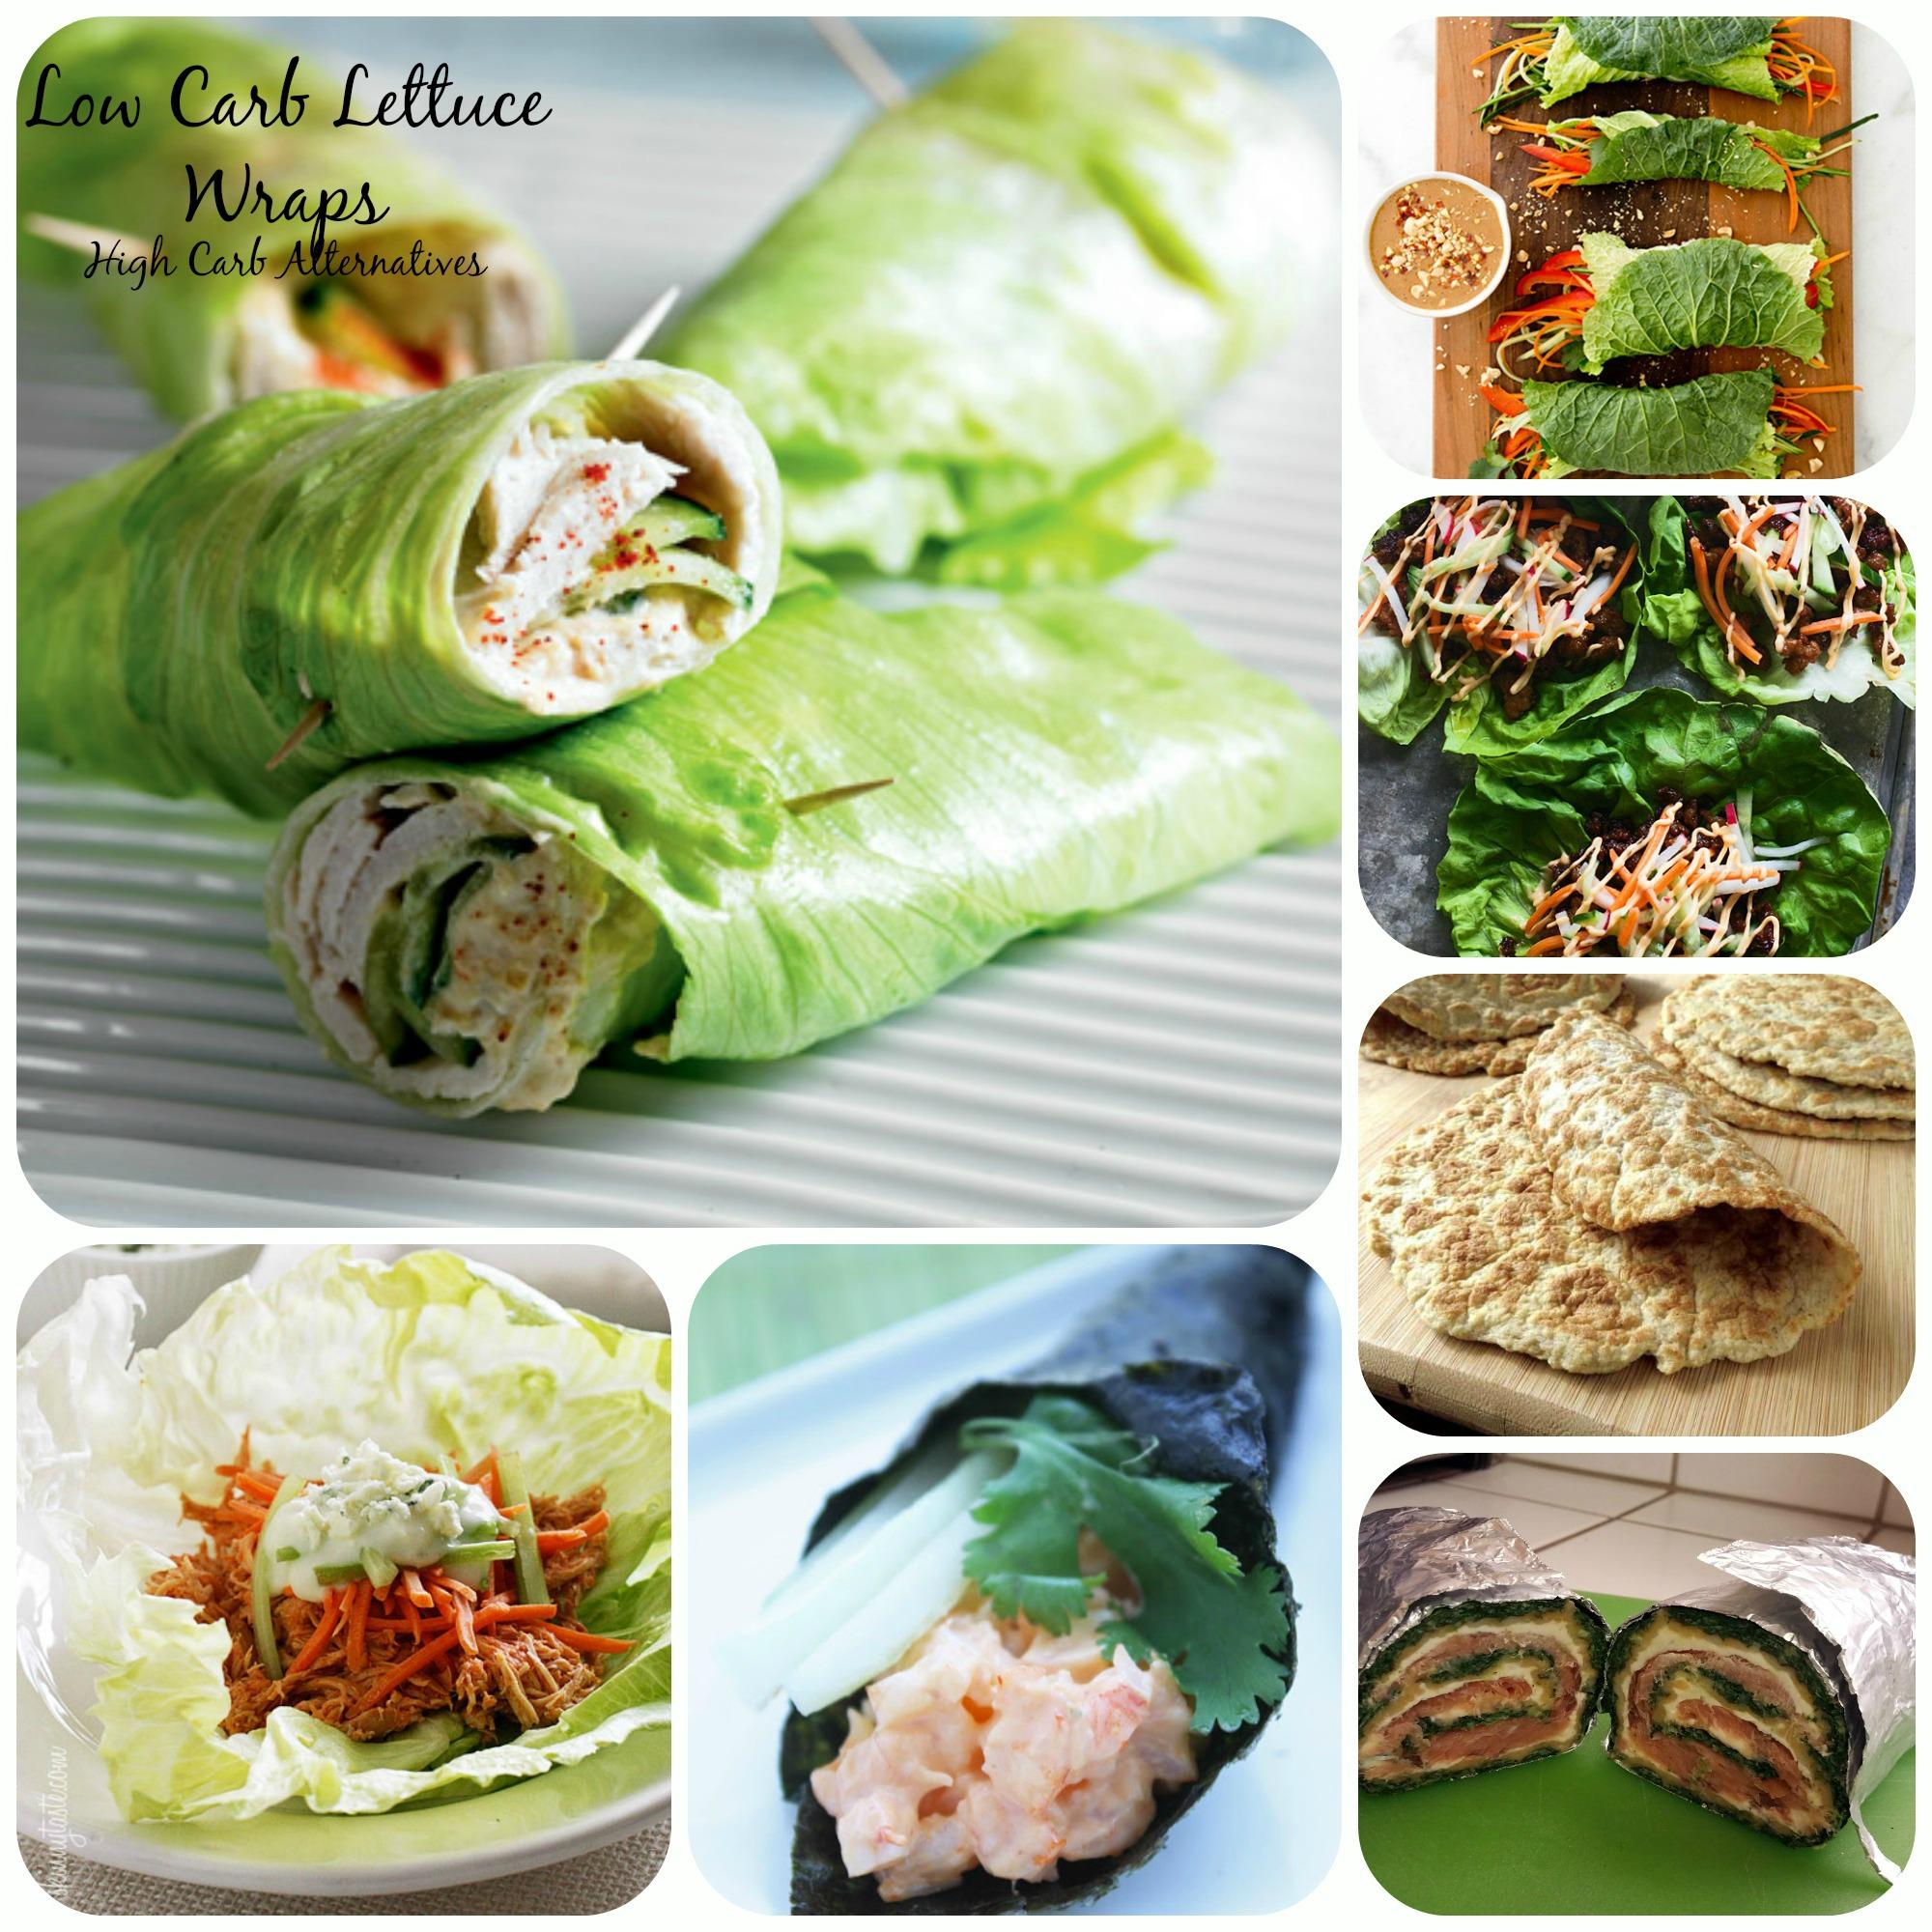 Low Carb Lettuce Wraps Collage.jpg